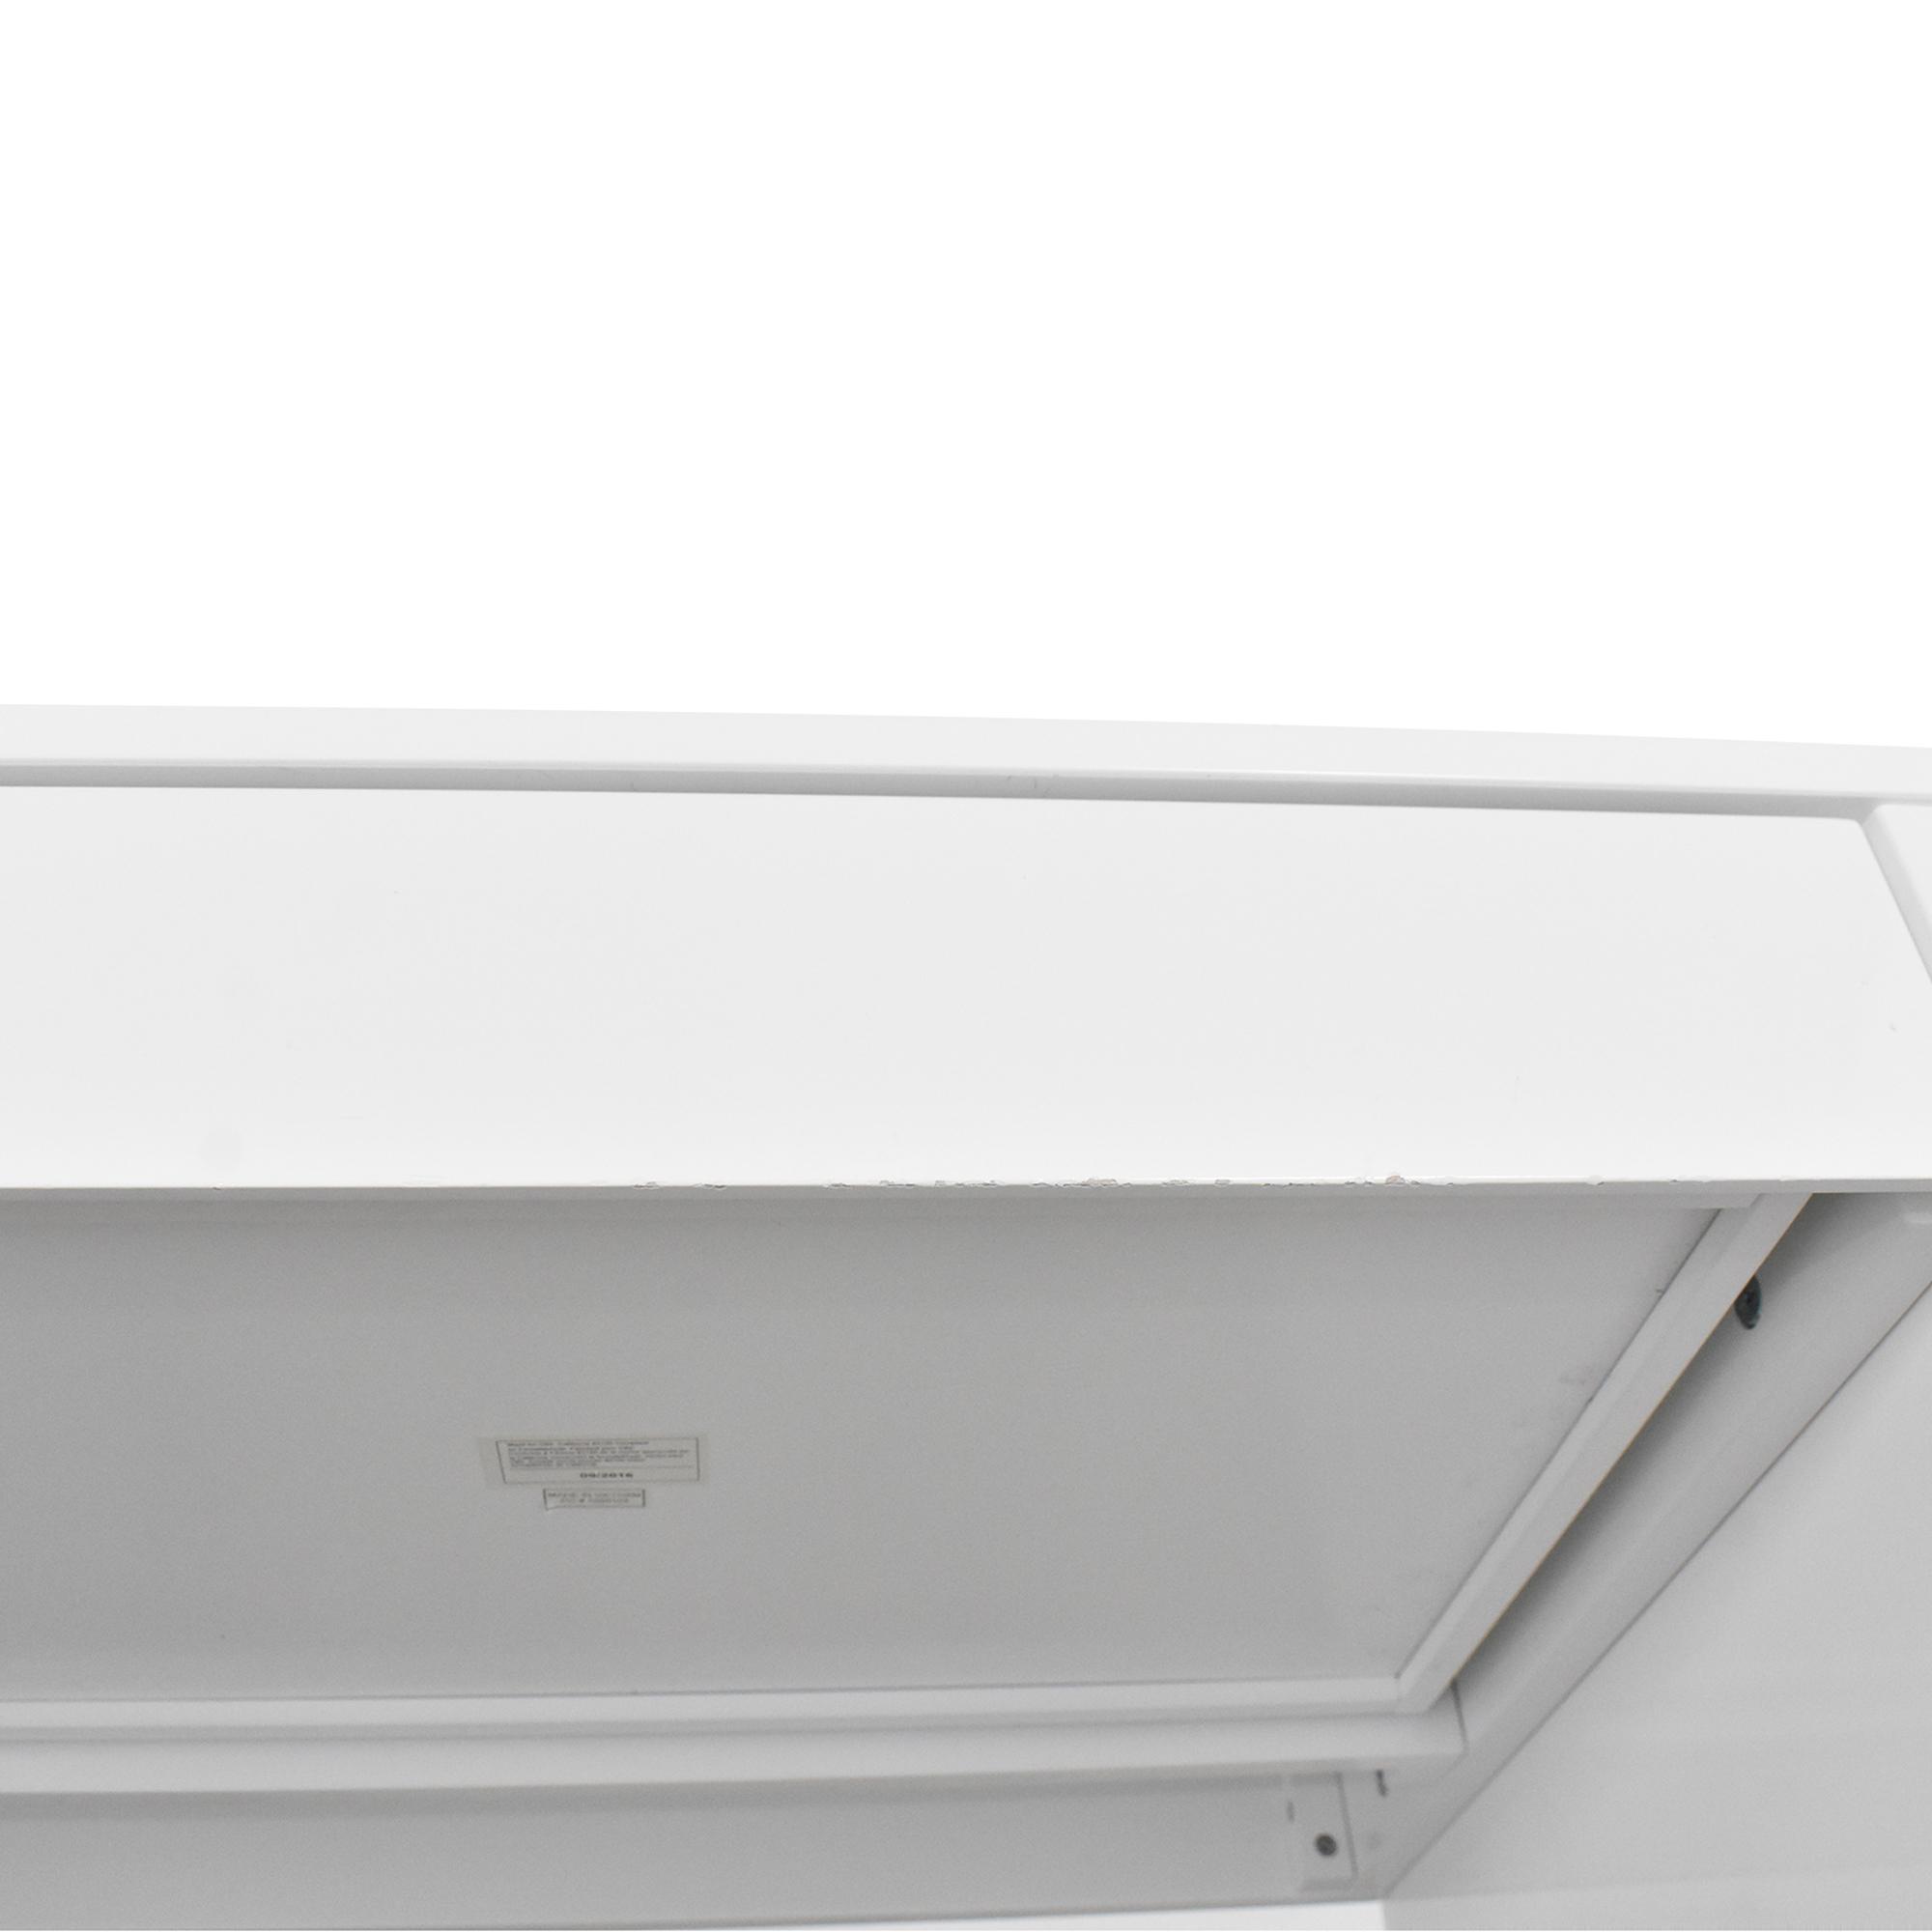 CB2 CB2 Runway Desk dimensions